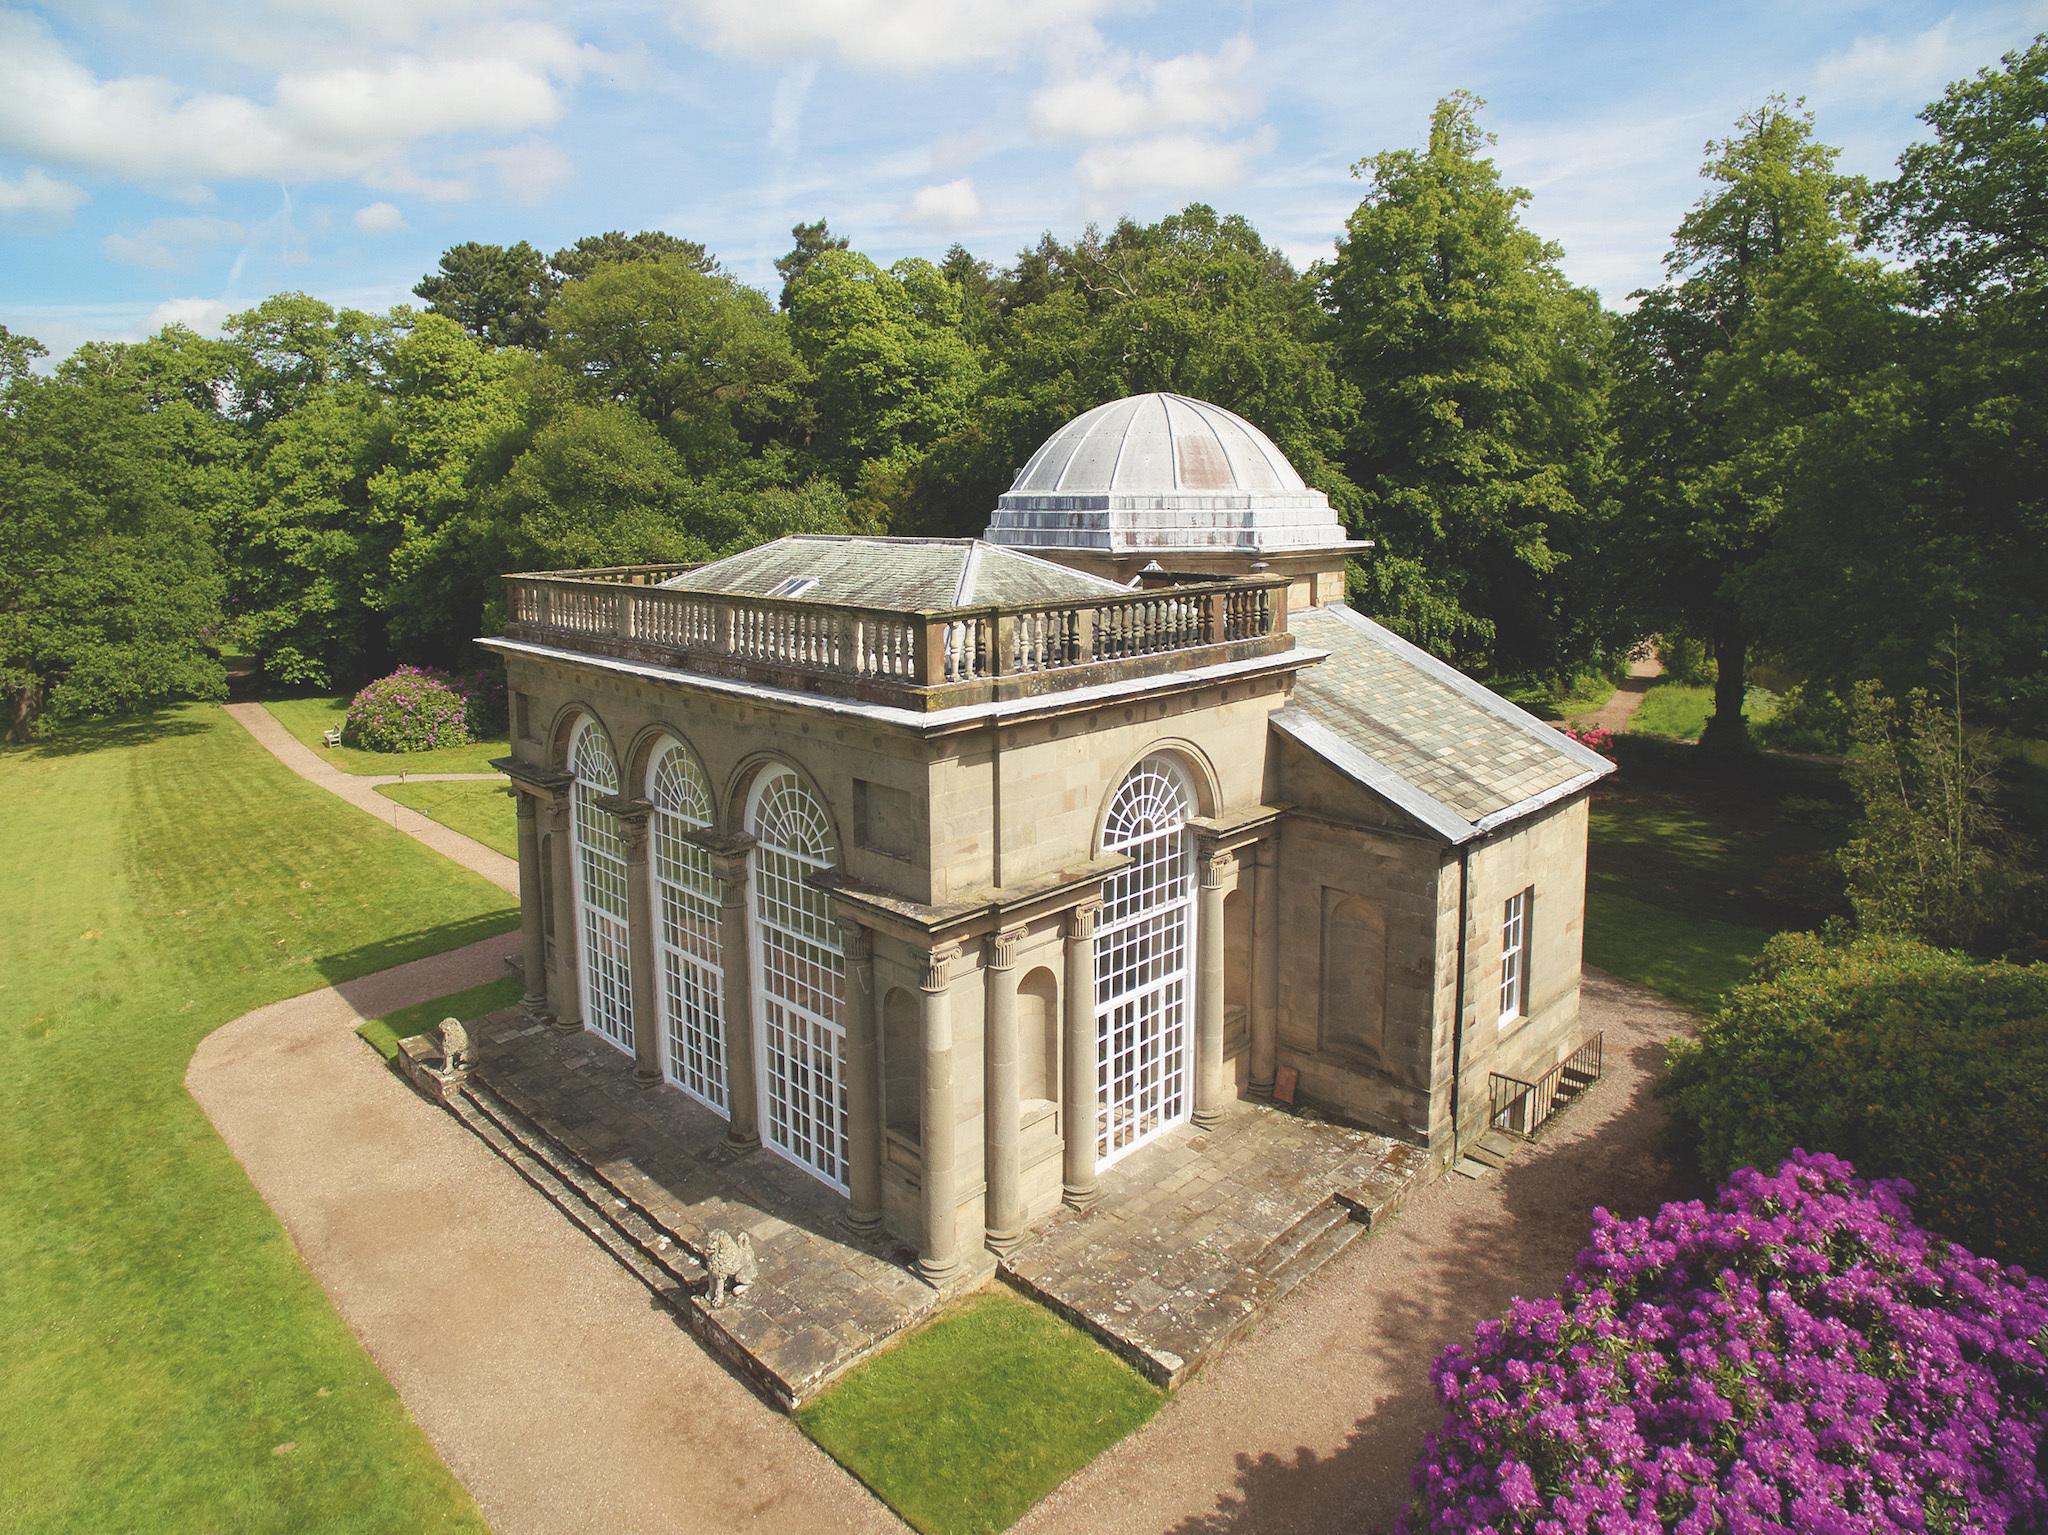 Temple of Diana, Shropshire